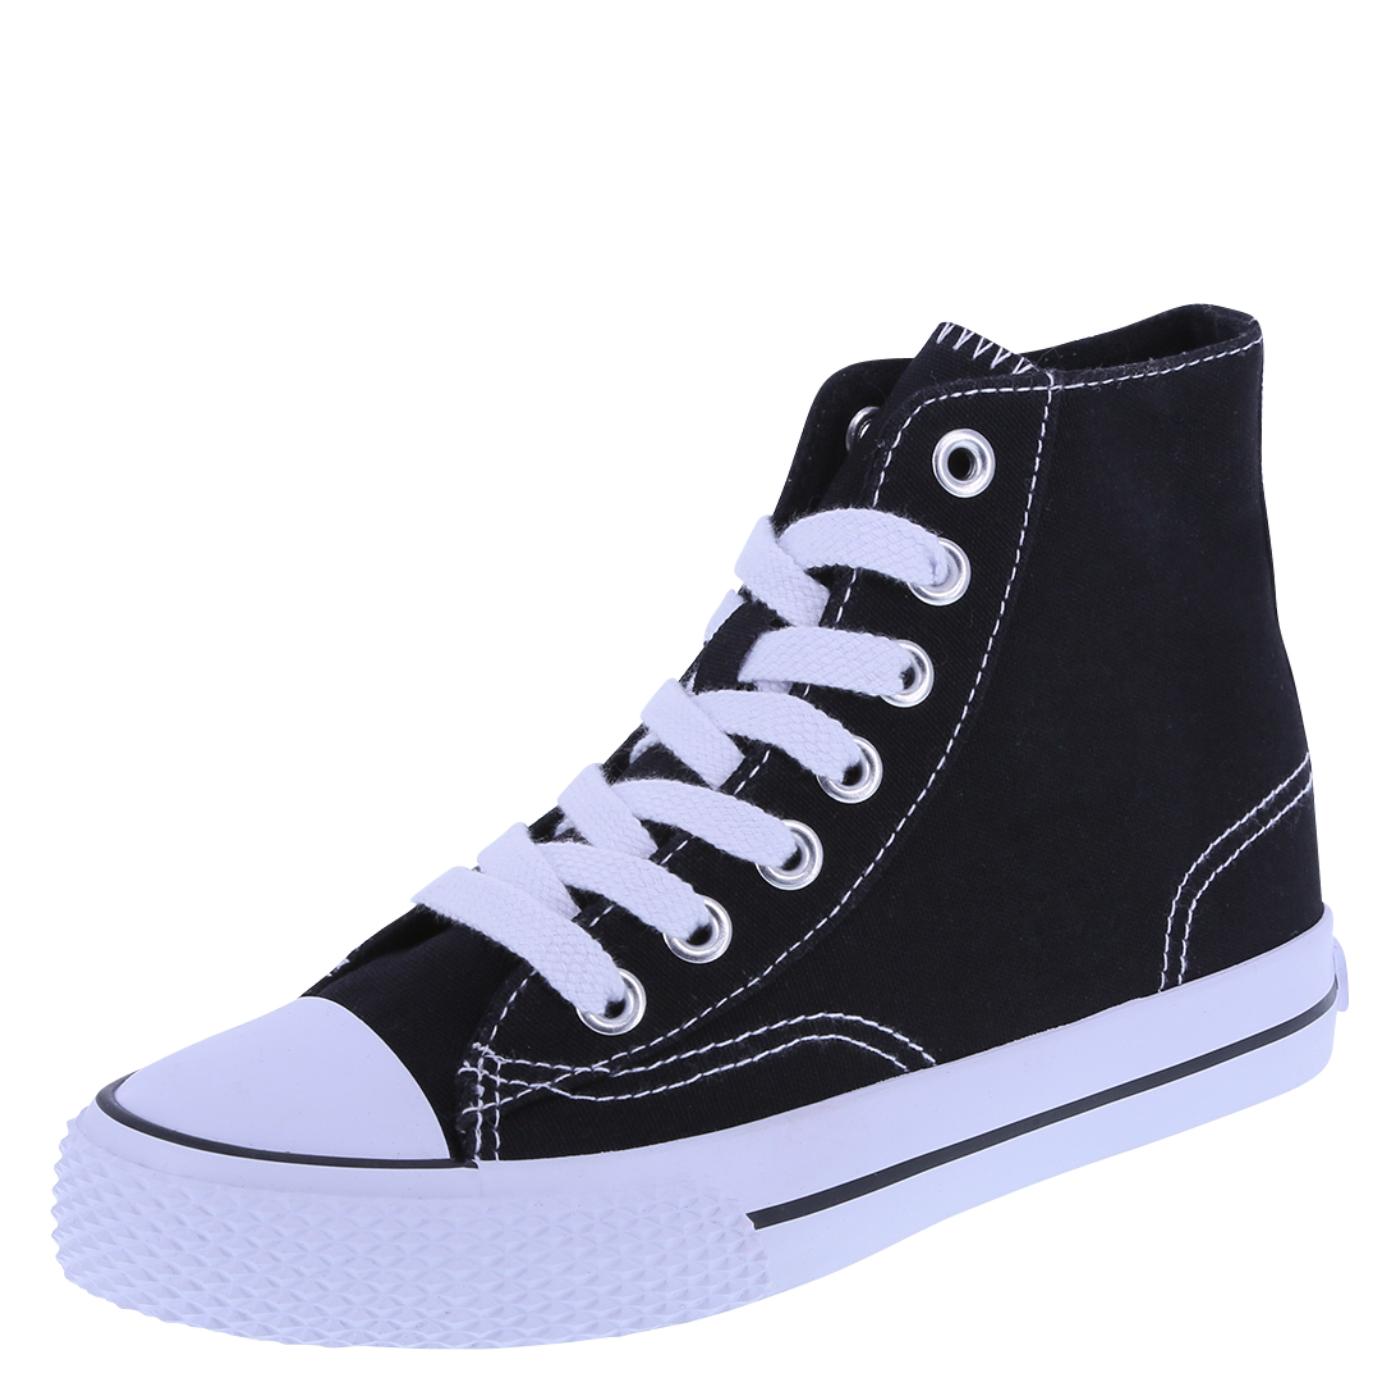 sneakers for girls kidsu0027 legacee sneaker high-top, black/white QQDPKYA